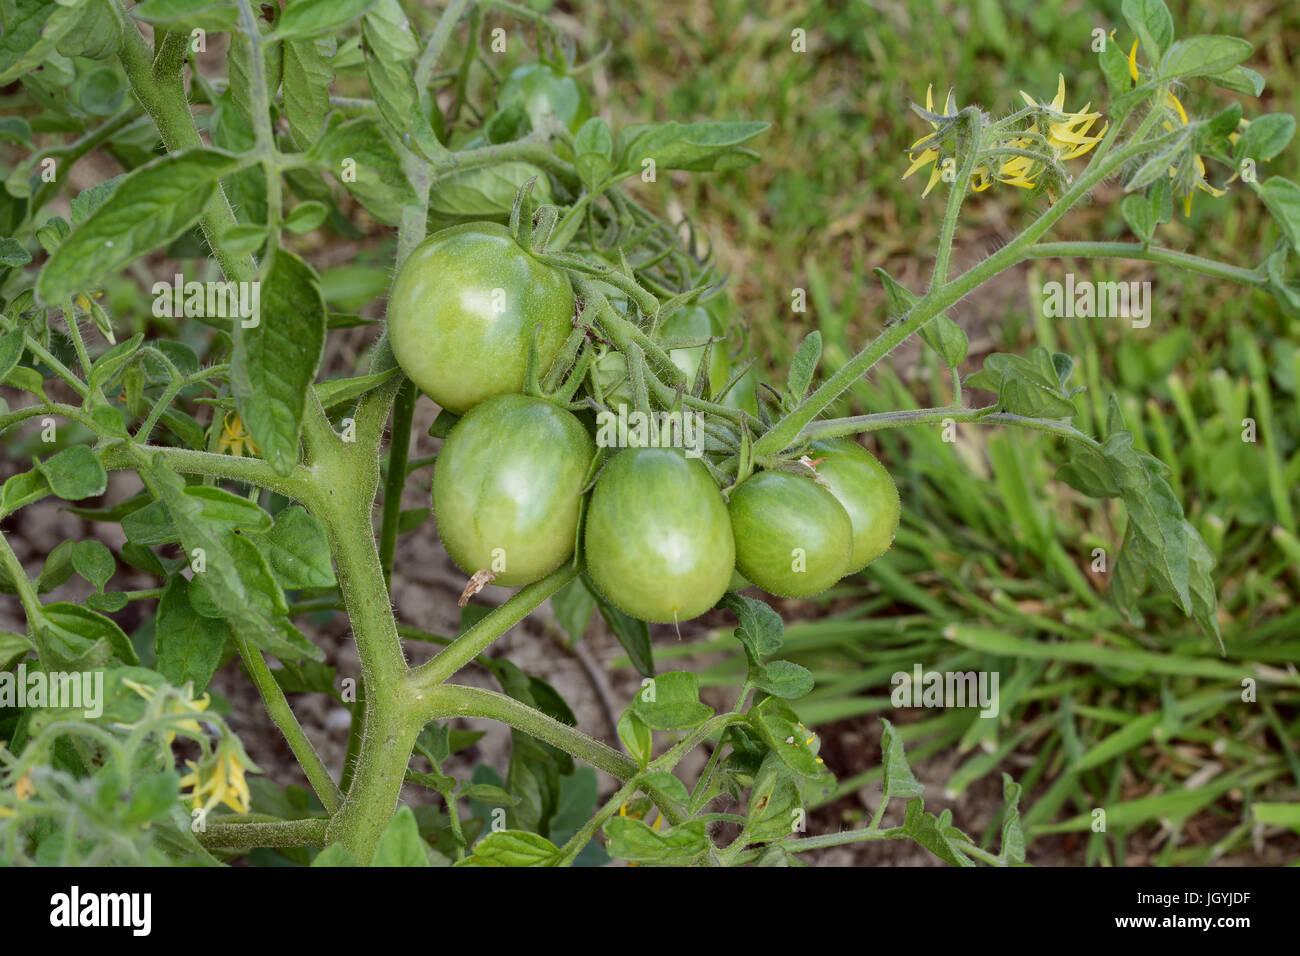 Image Of Do Tomato Plants Grow Yellow Flowers Tomato Plants Growing